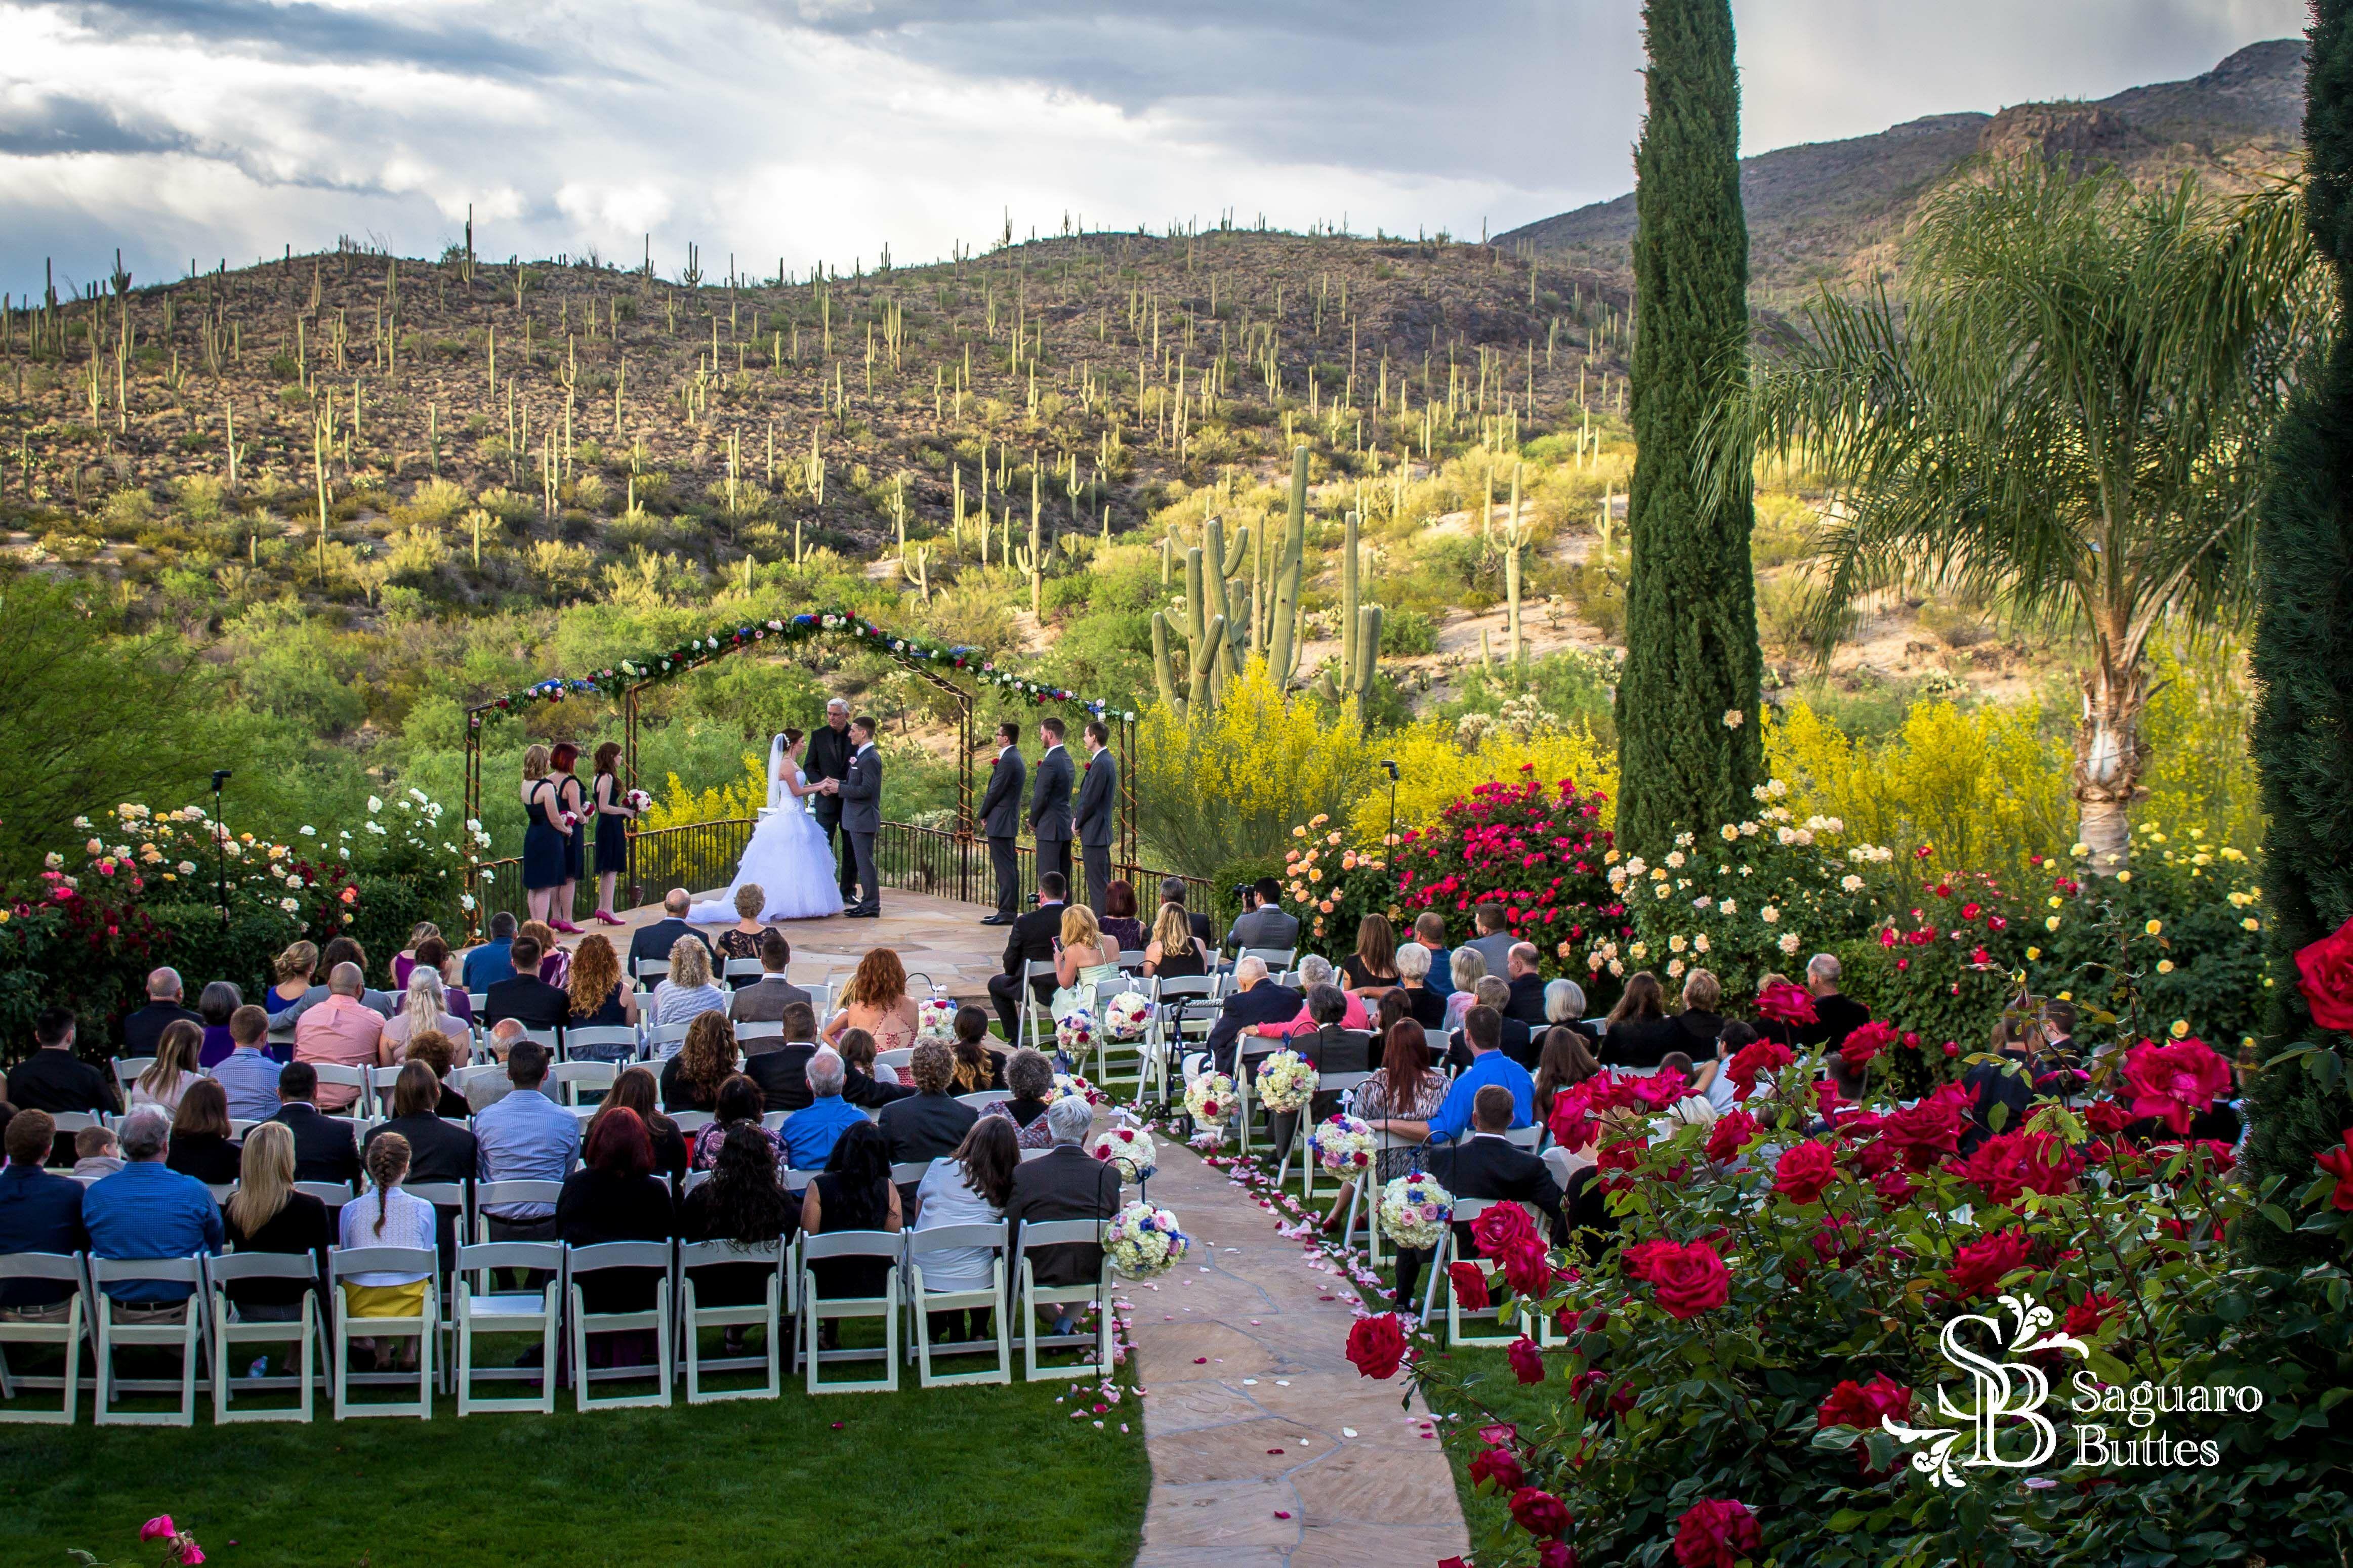 Wedding Invitations Tucson: Reception Venues - Tucson, AZ